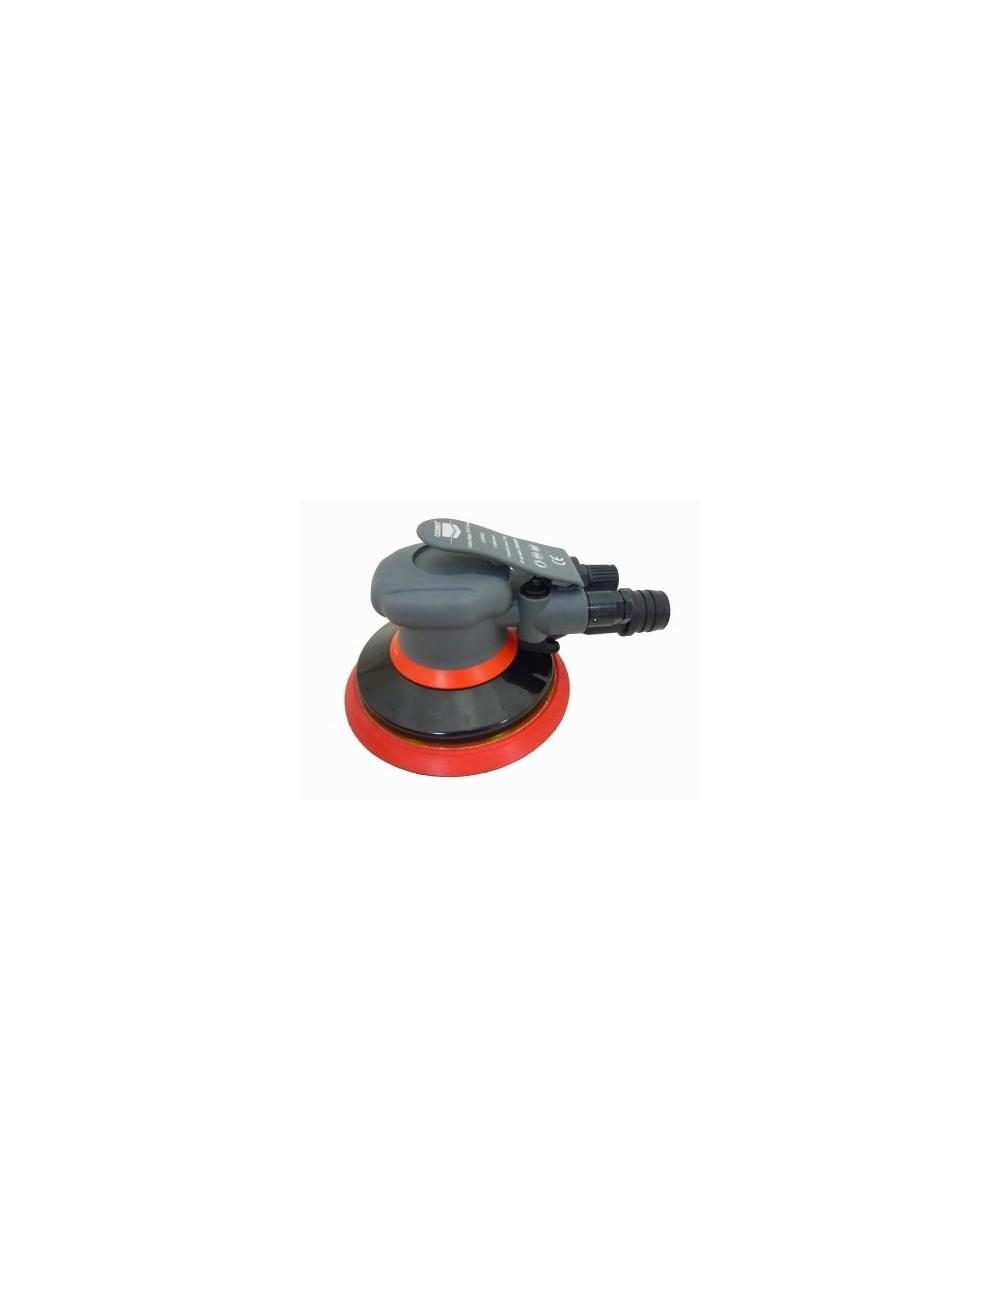 Ponceuse orbitale rotative aspirante 2,5 mm